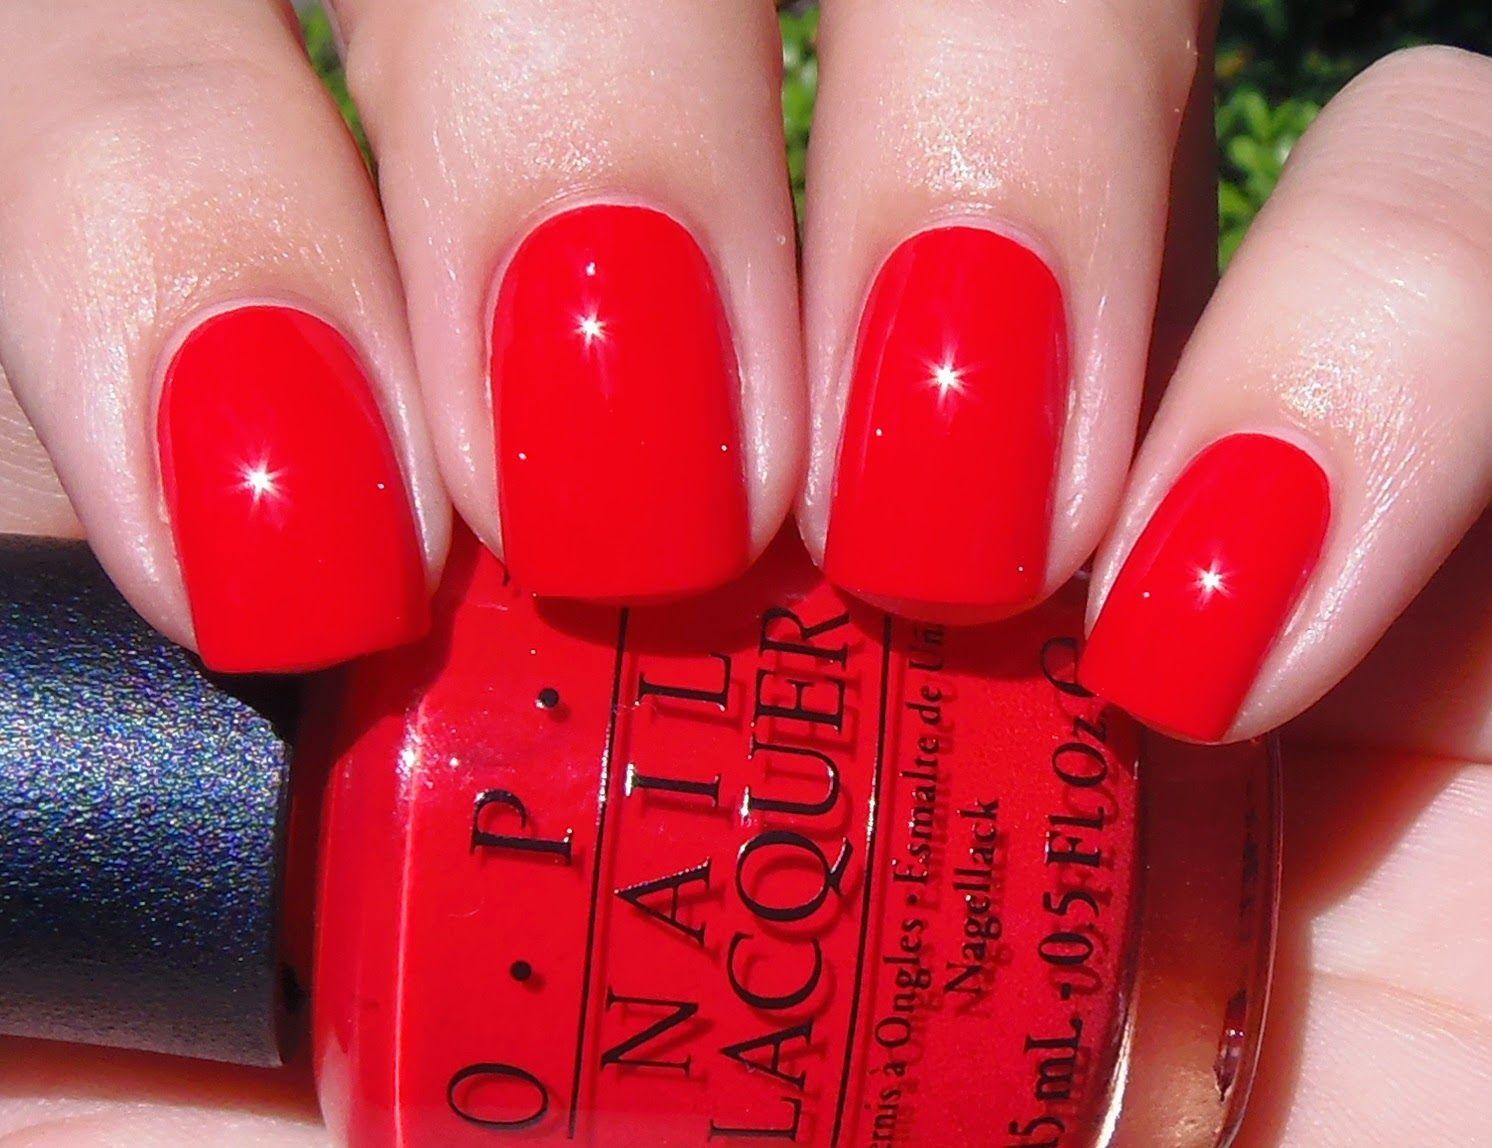 sparkly vernis opi coca-cola red